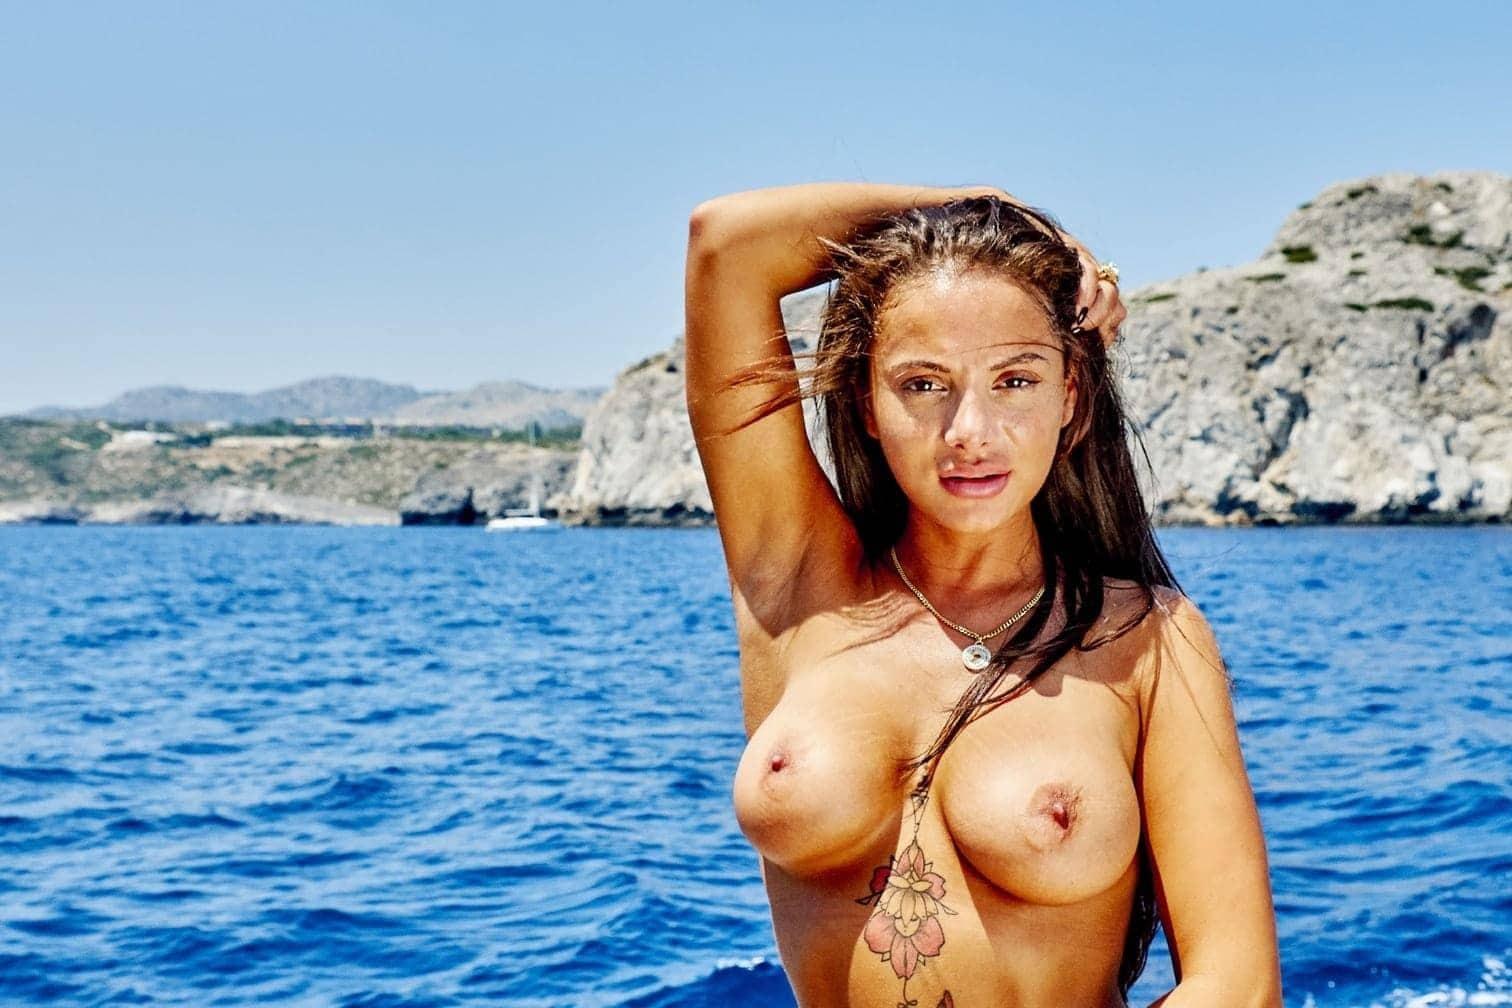 <p>Model und DSDS-Teilnehmerin Emilija Mihailova: